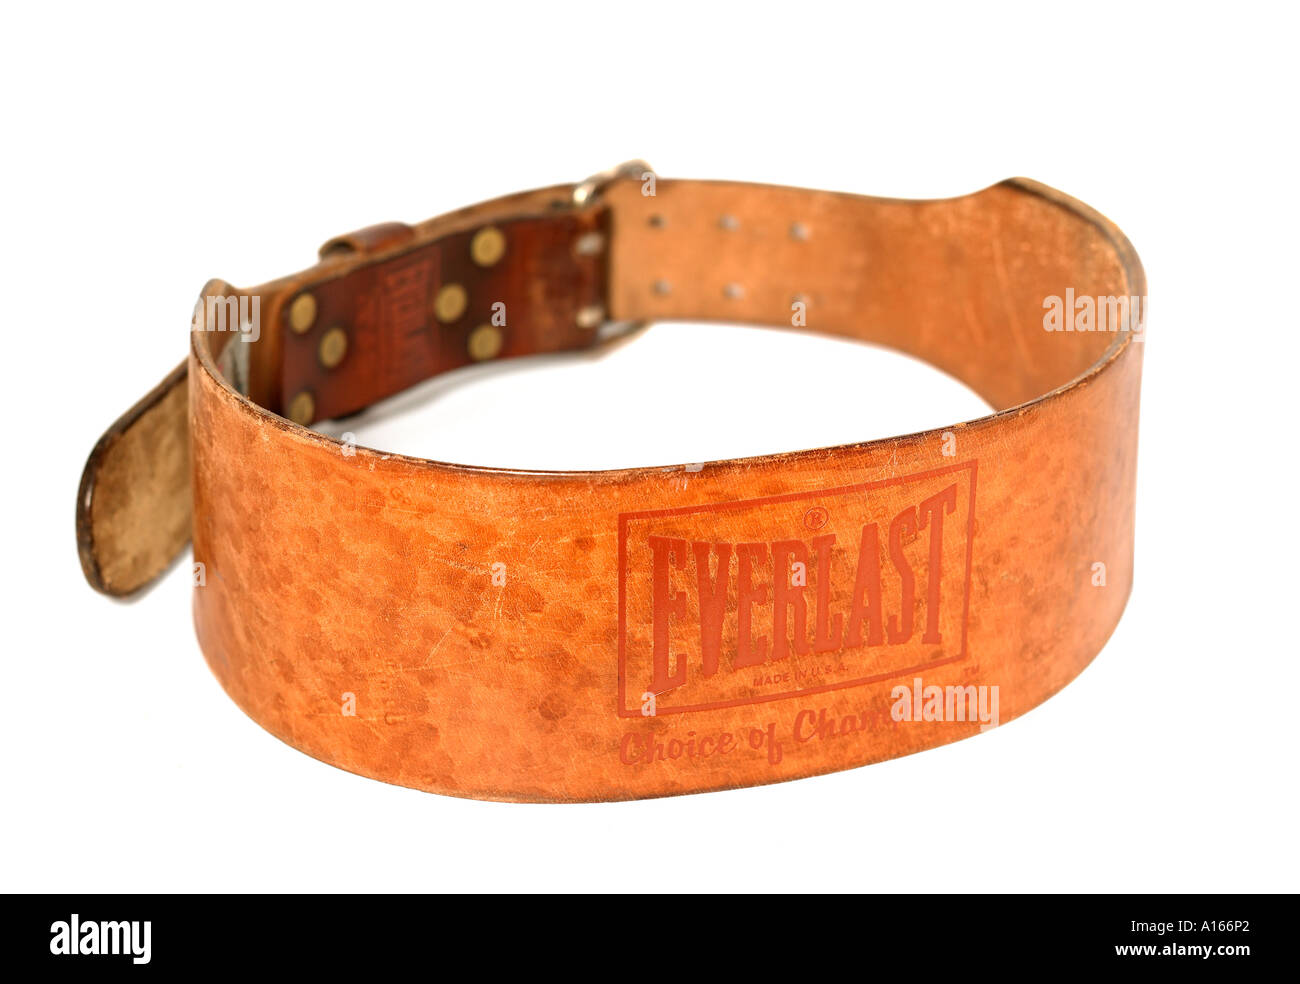 Weight Belt - Stock Image